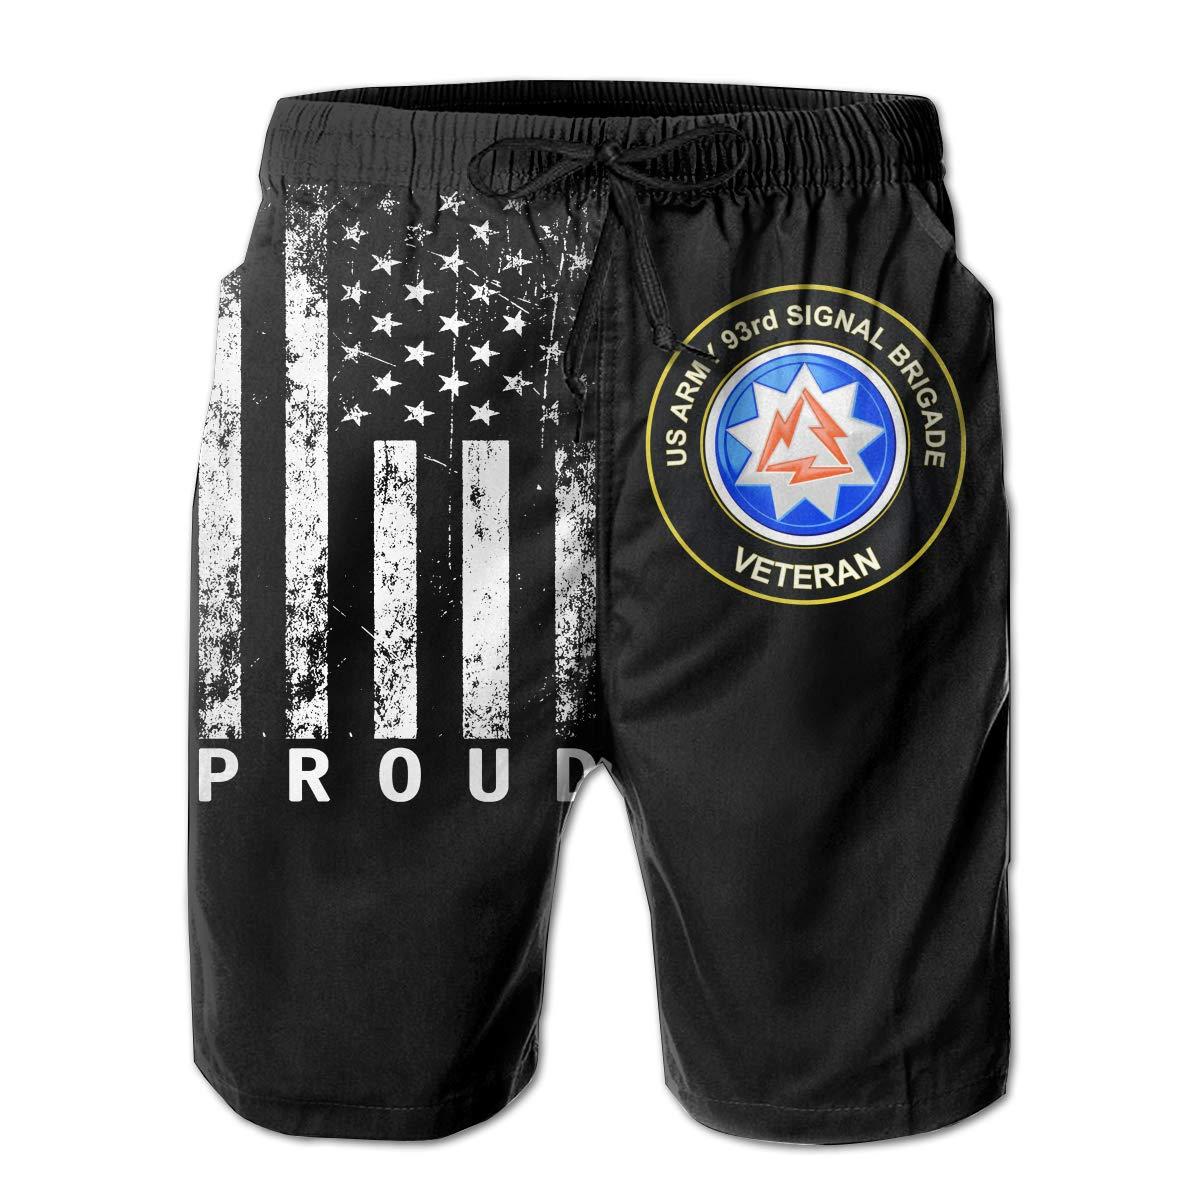 US Army 93rd Signal Brigade Unit Crest Veteran Mens Quick Dry Swim Trunks Beach Shorts with Mesh Lining